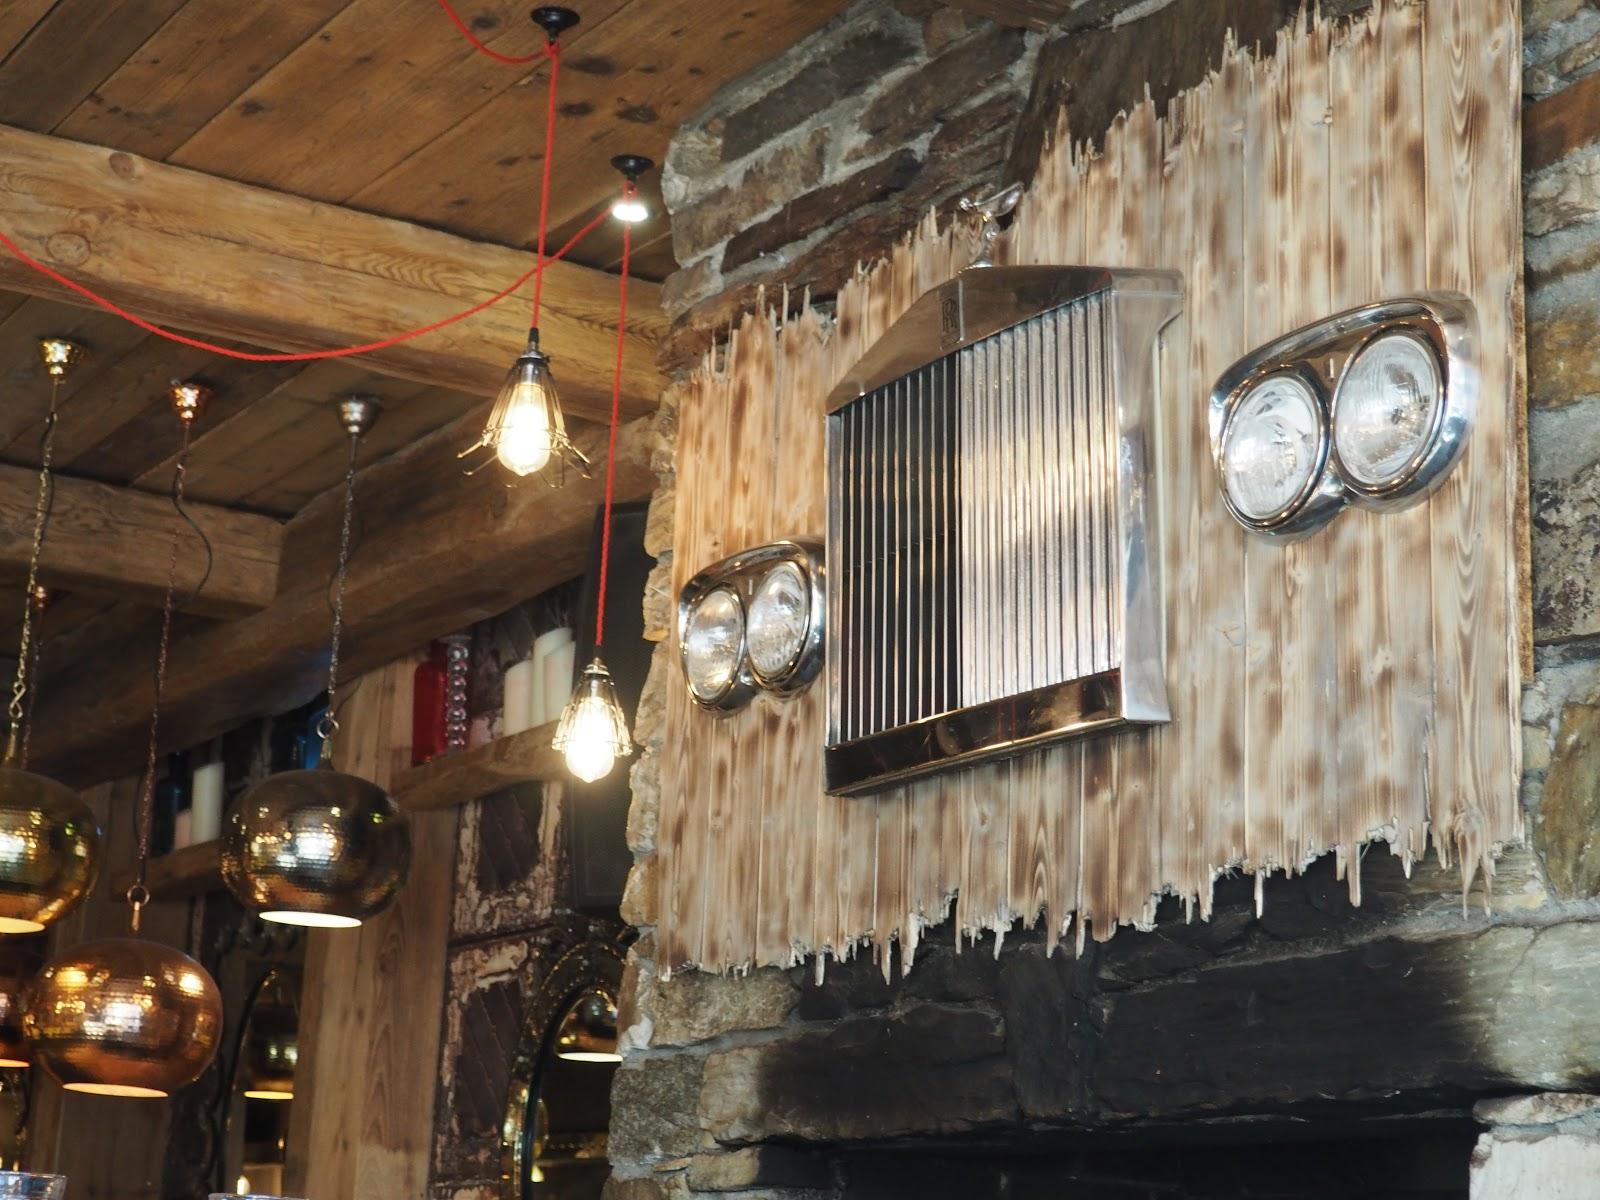 La Baraque interior in Val d'isere, France